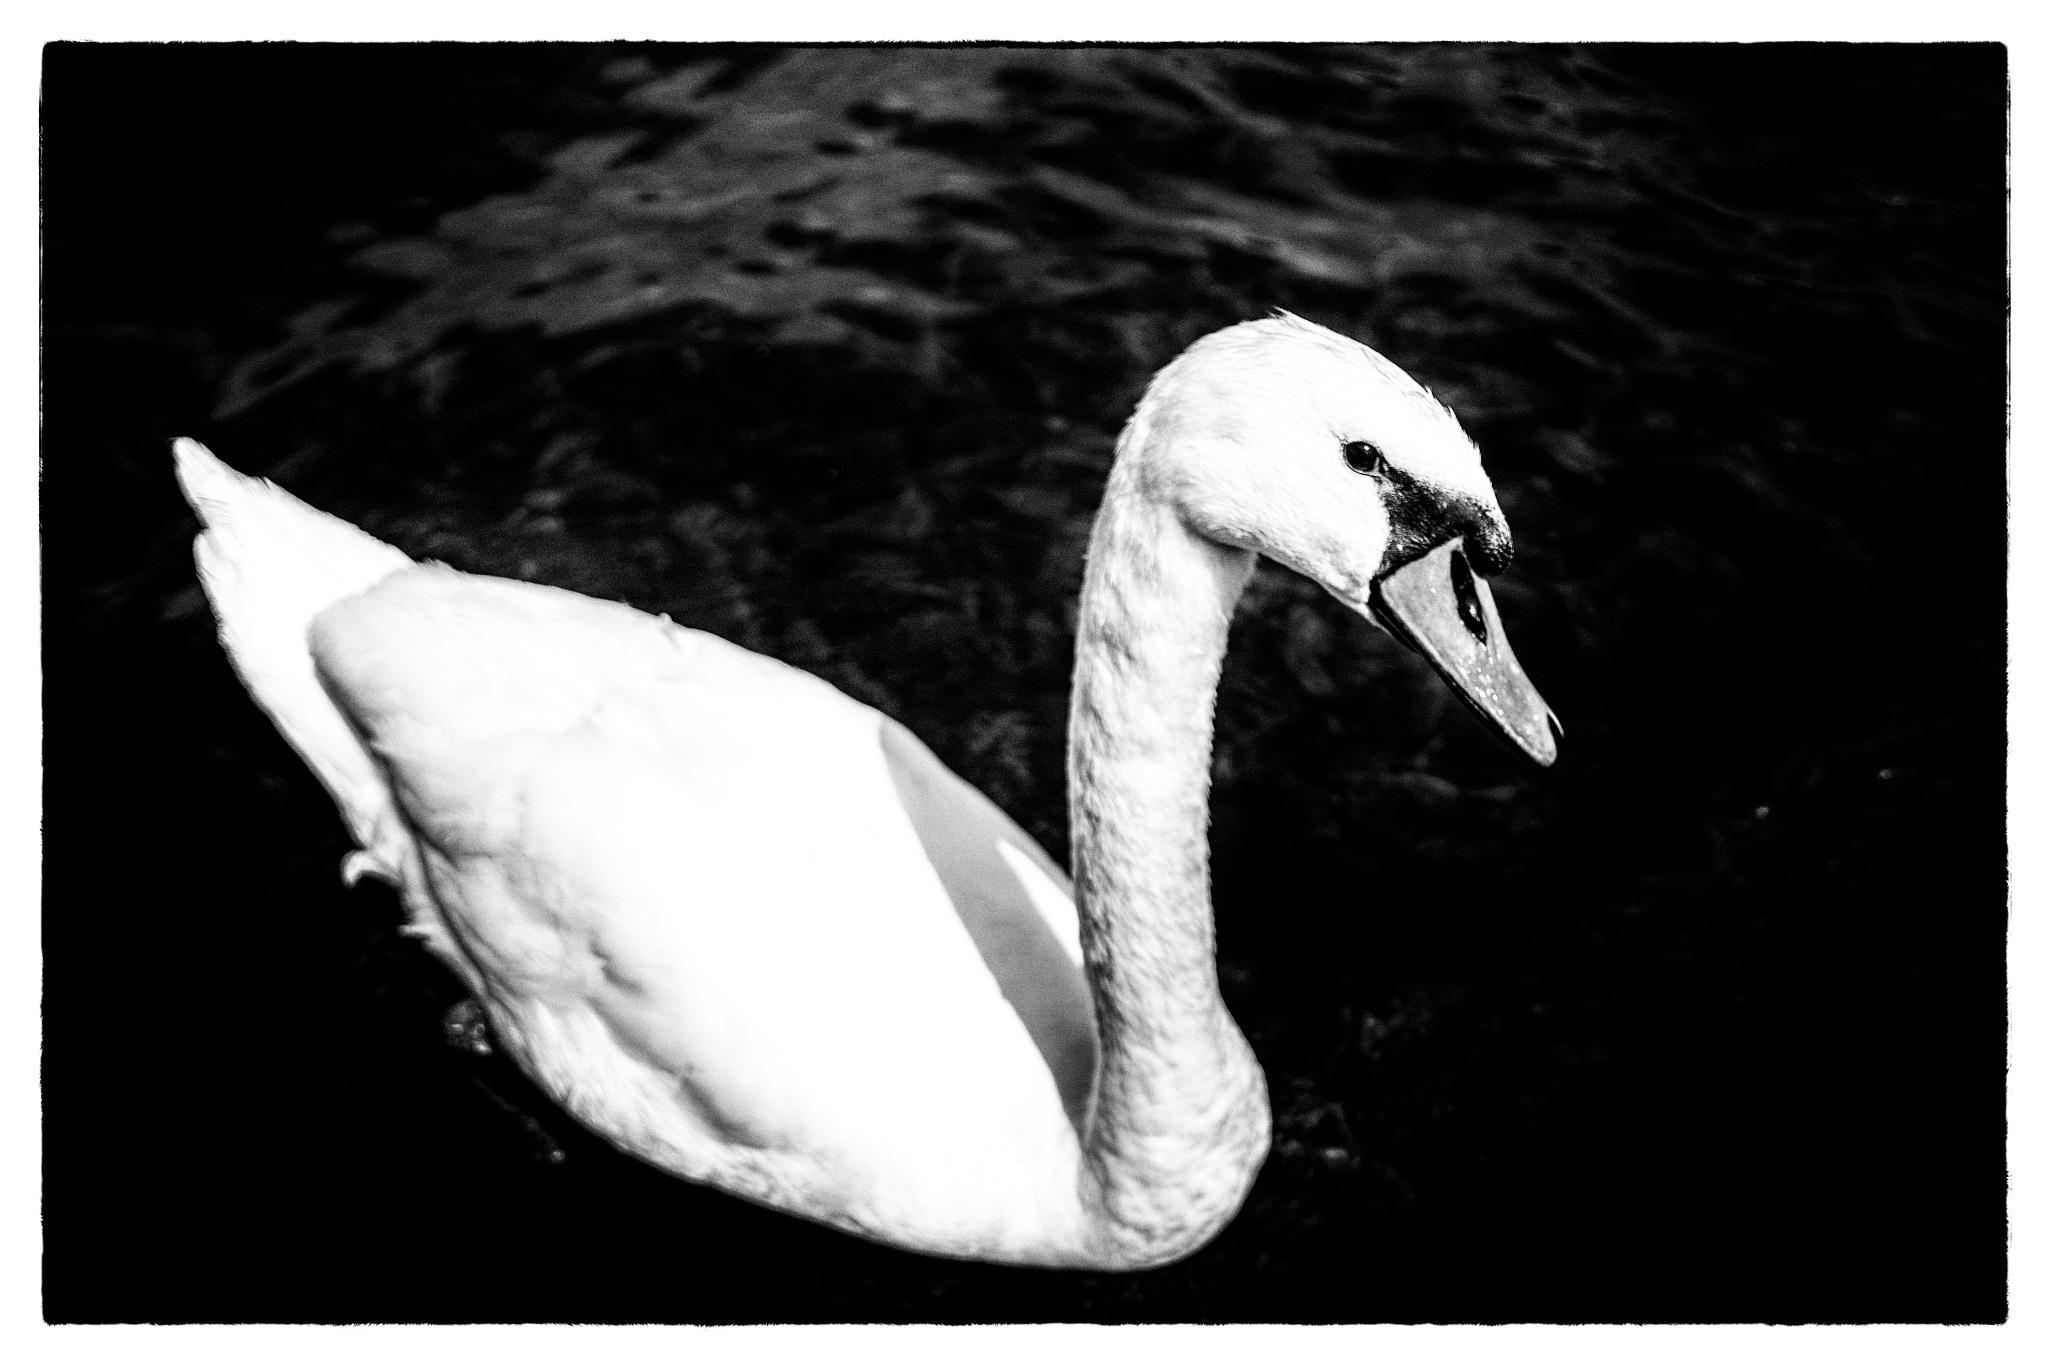 Swan-B&W by Venelin Todorov